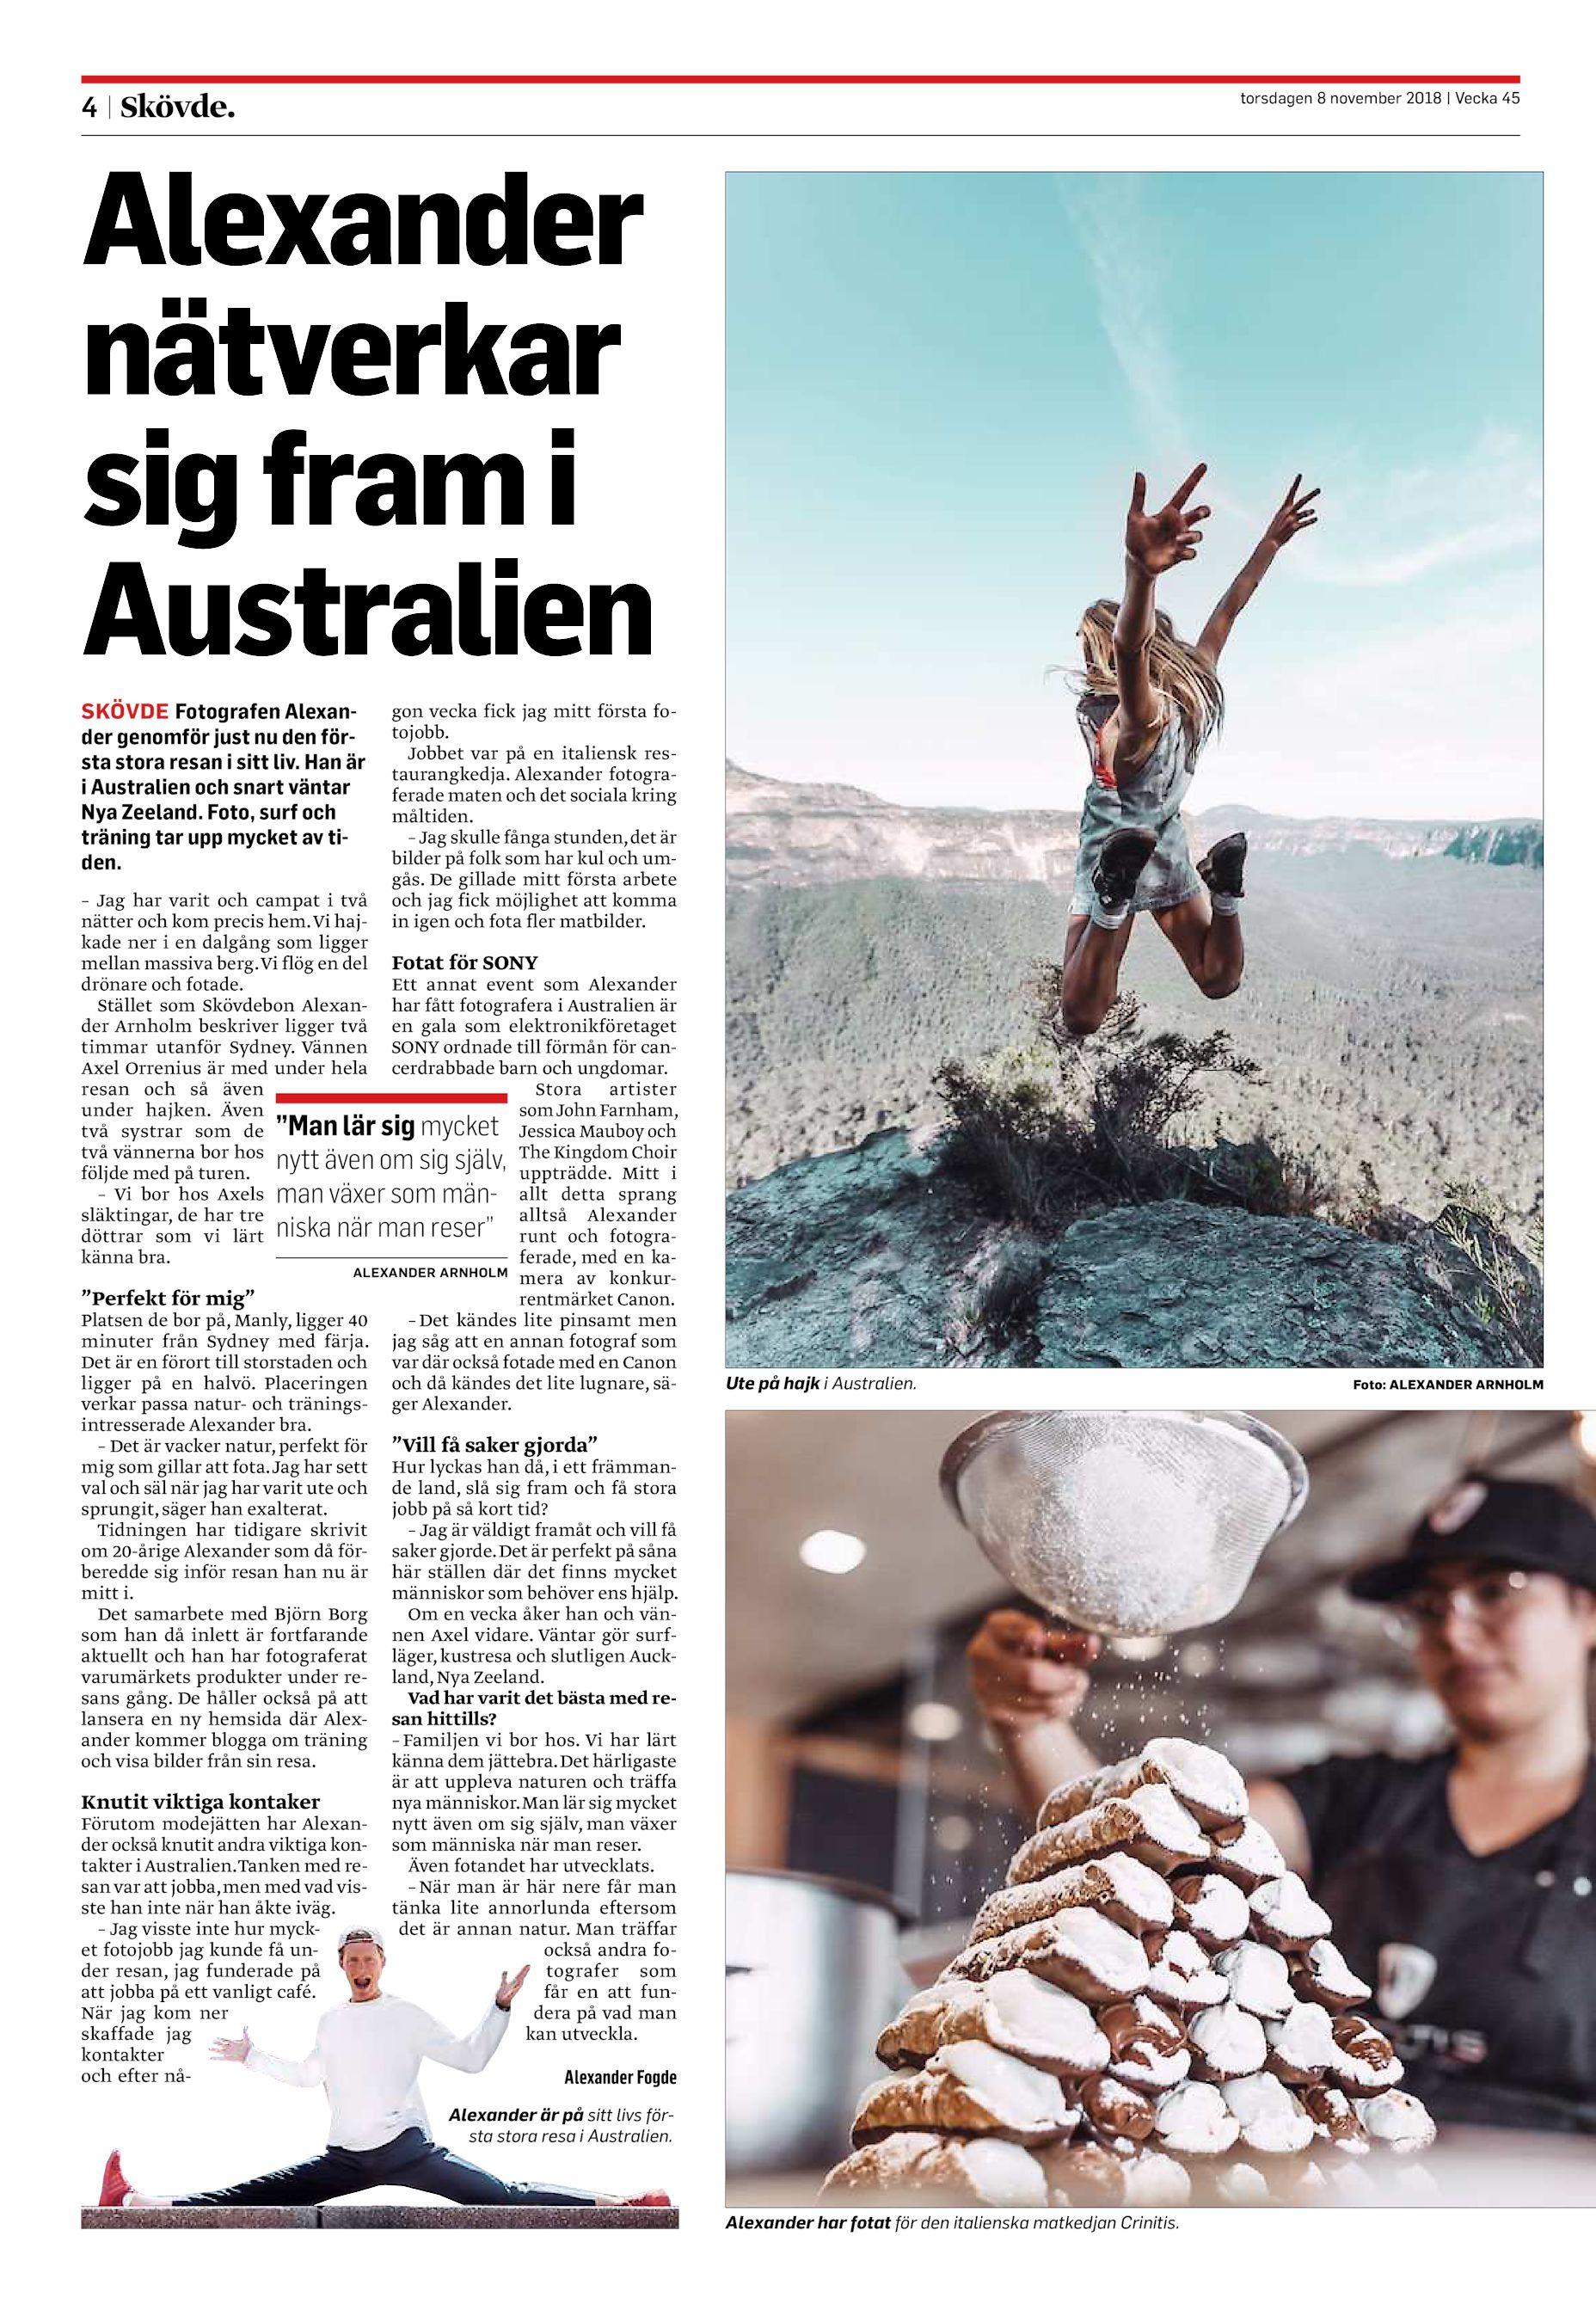 Skvde Nyheter SN-20181101 (endast text)